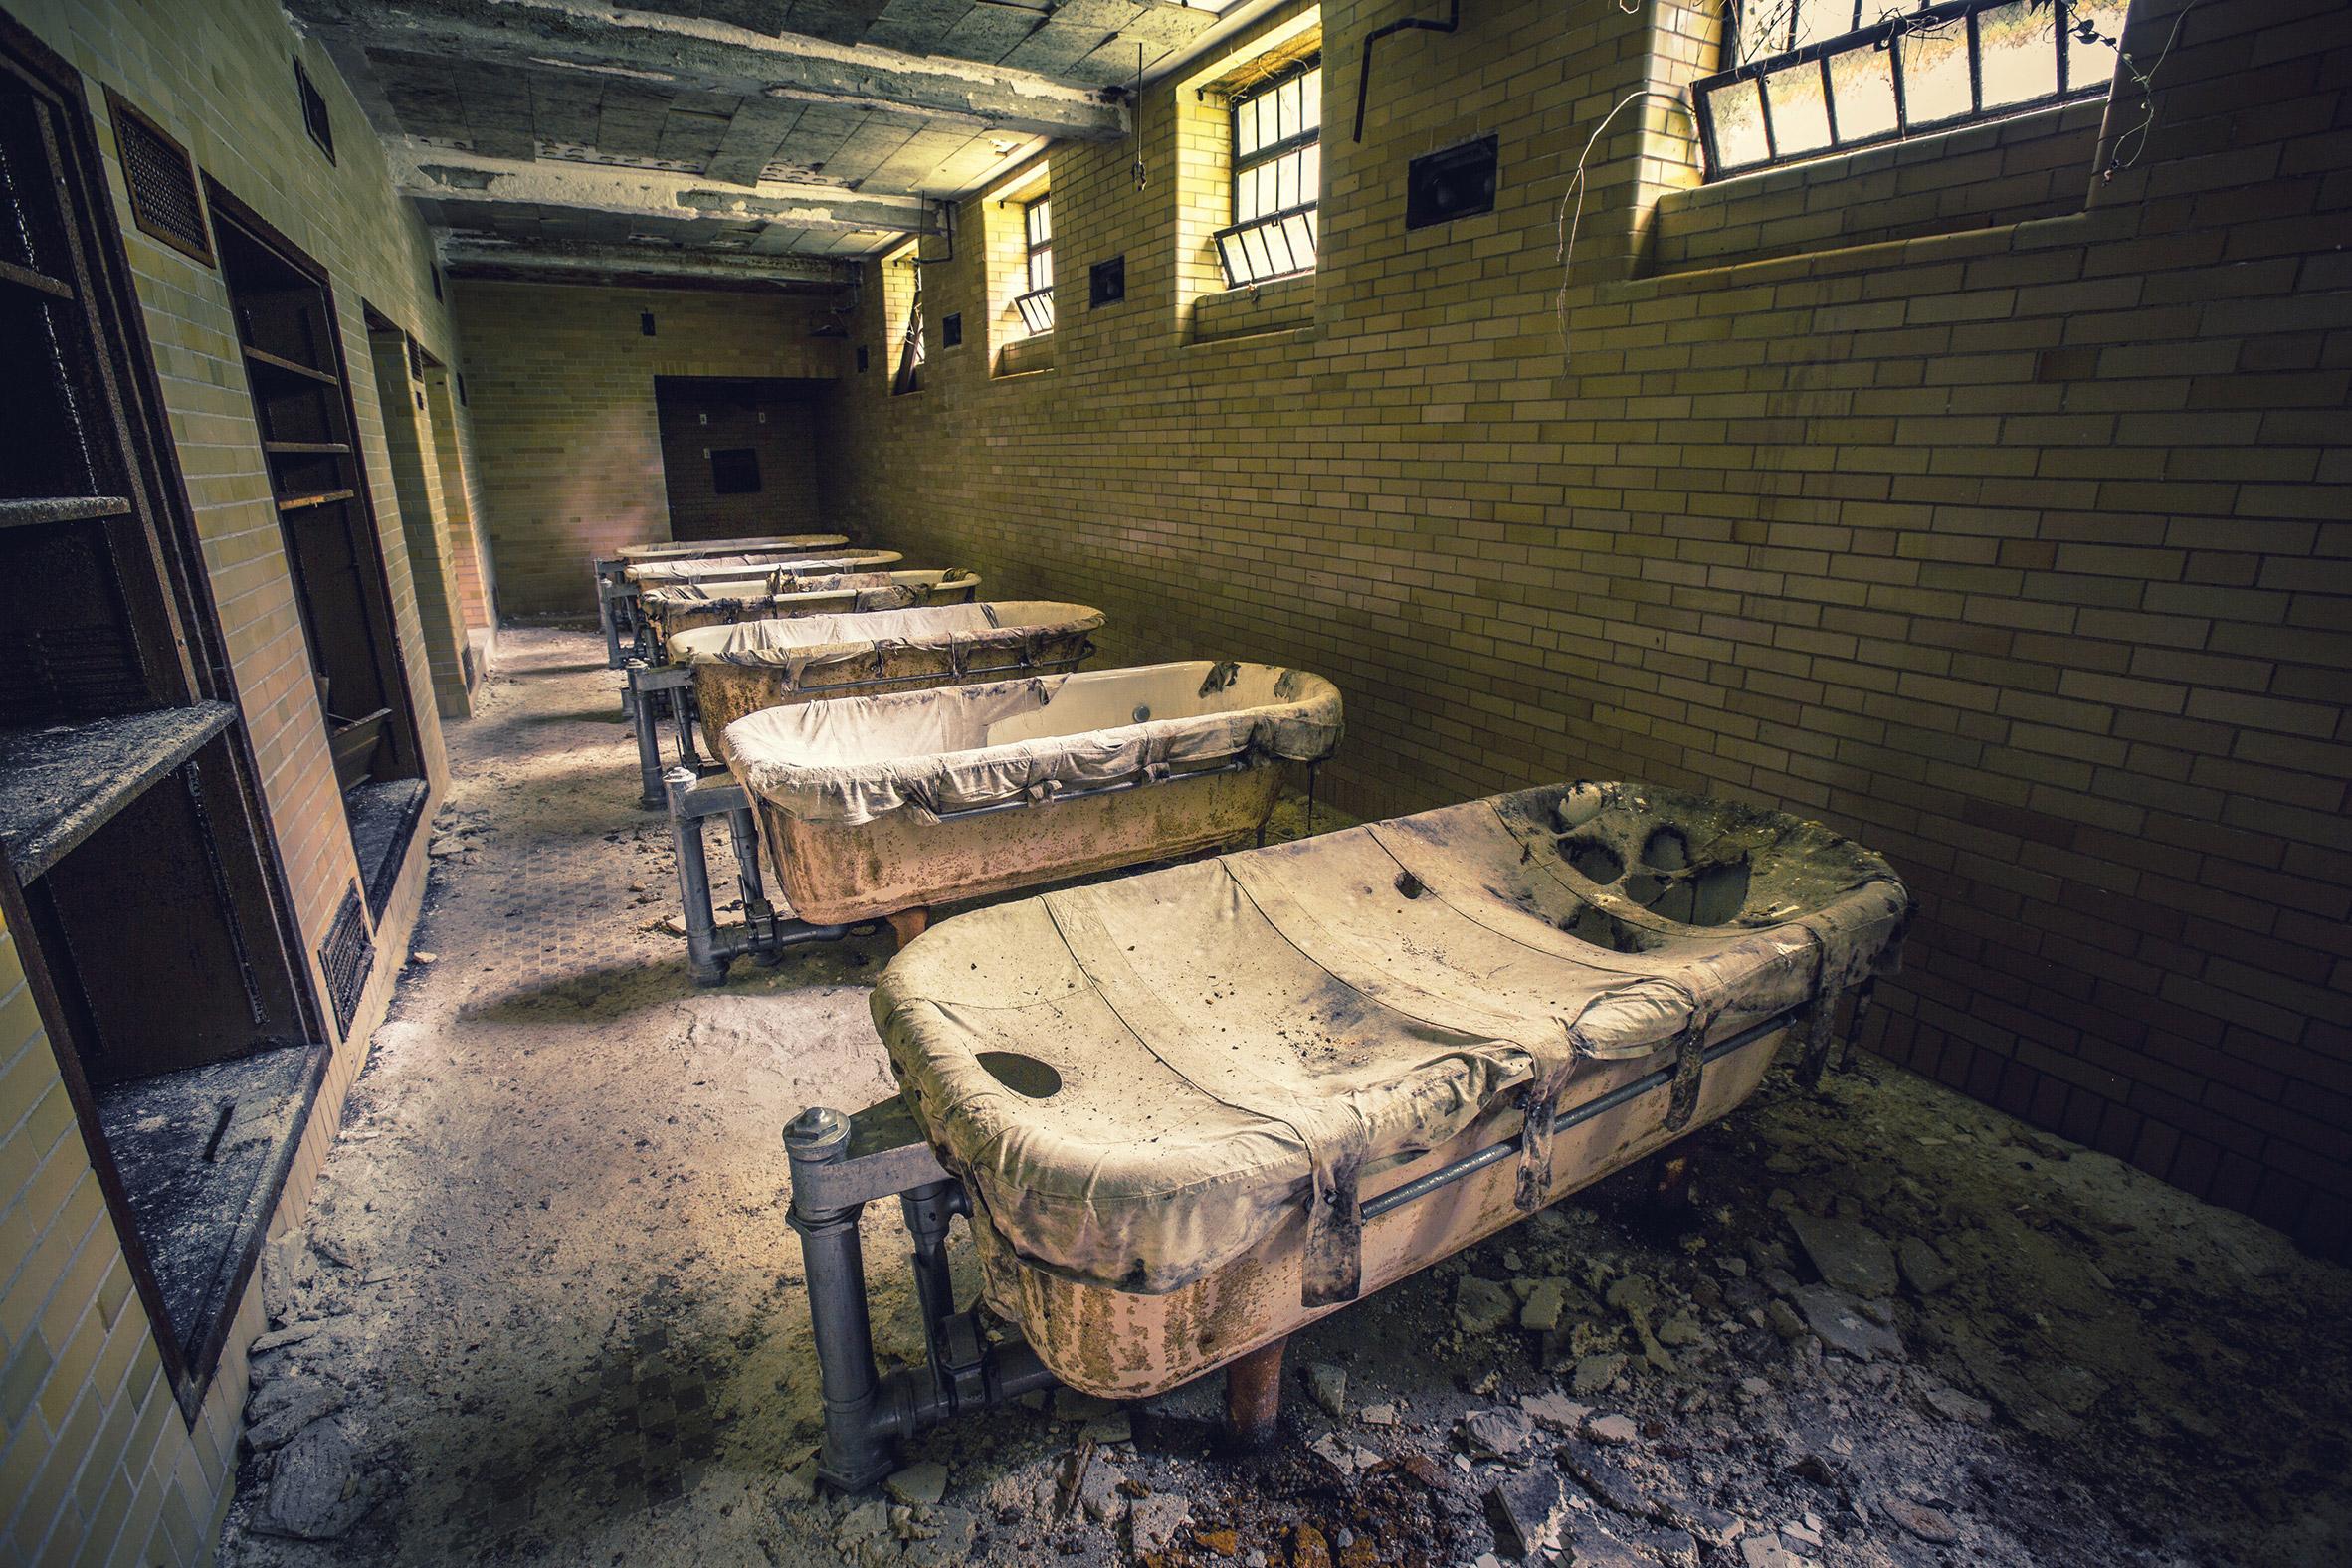 Abandoned-Asylums-1.jpg